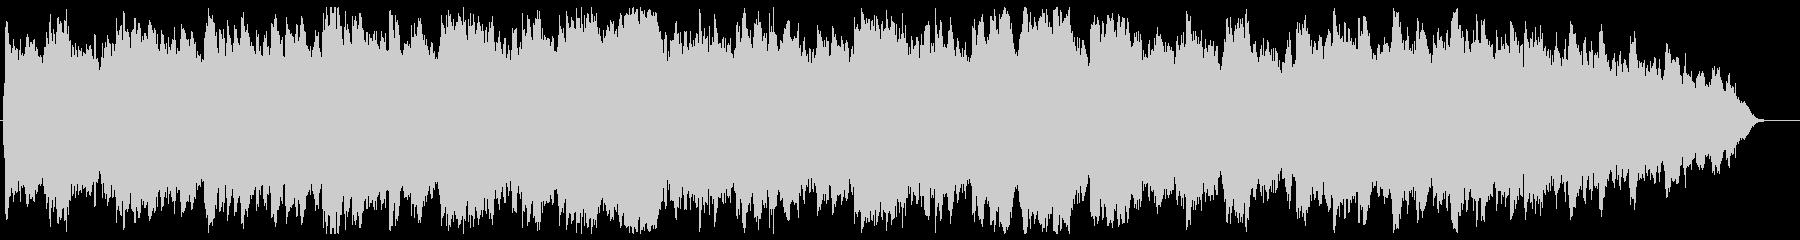 Avemari (Schubert)'s unreproduced waveform